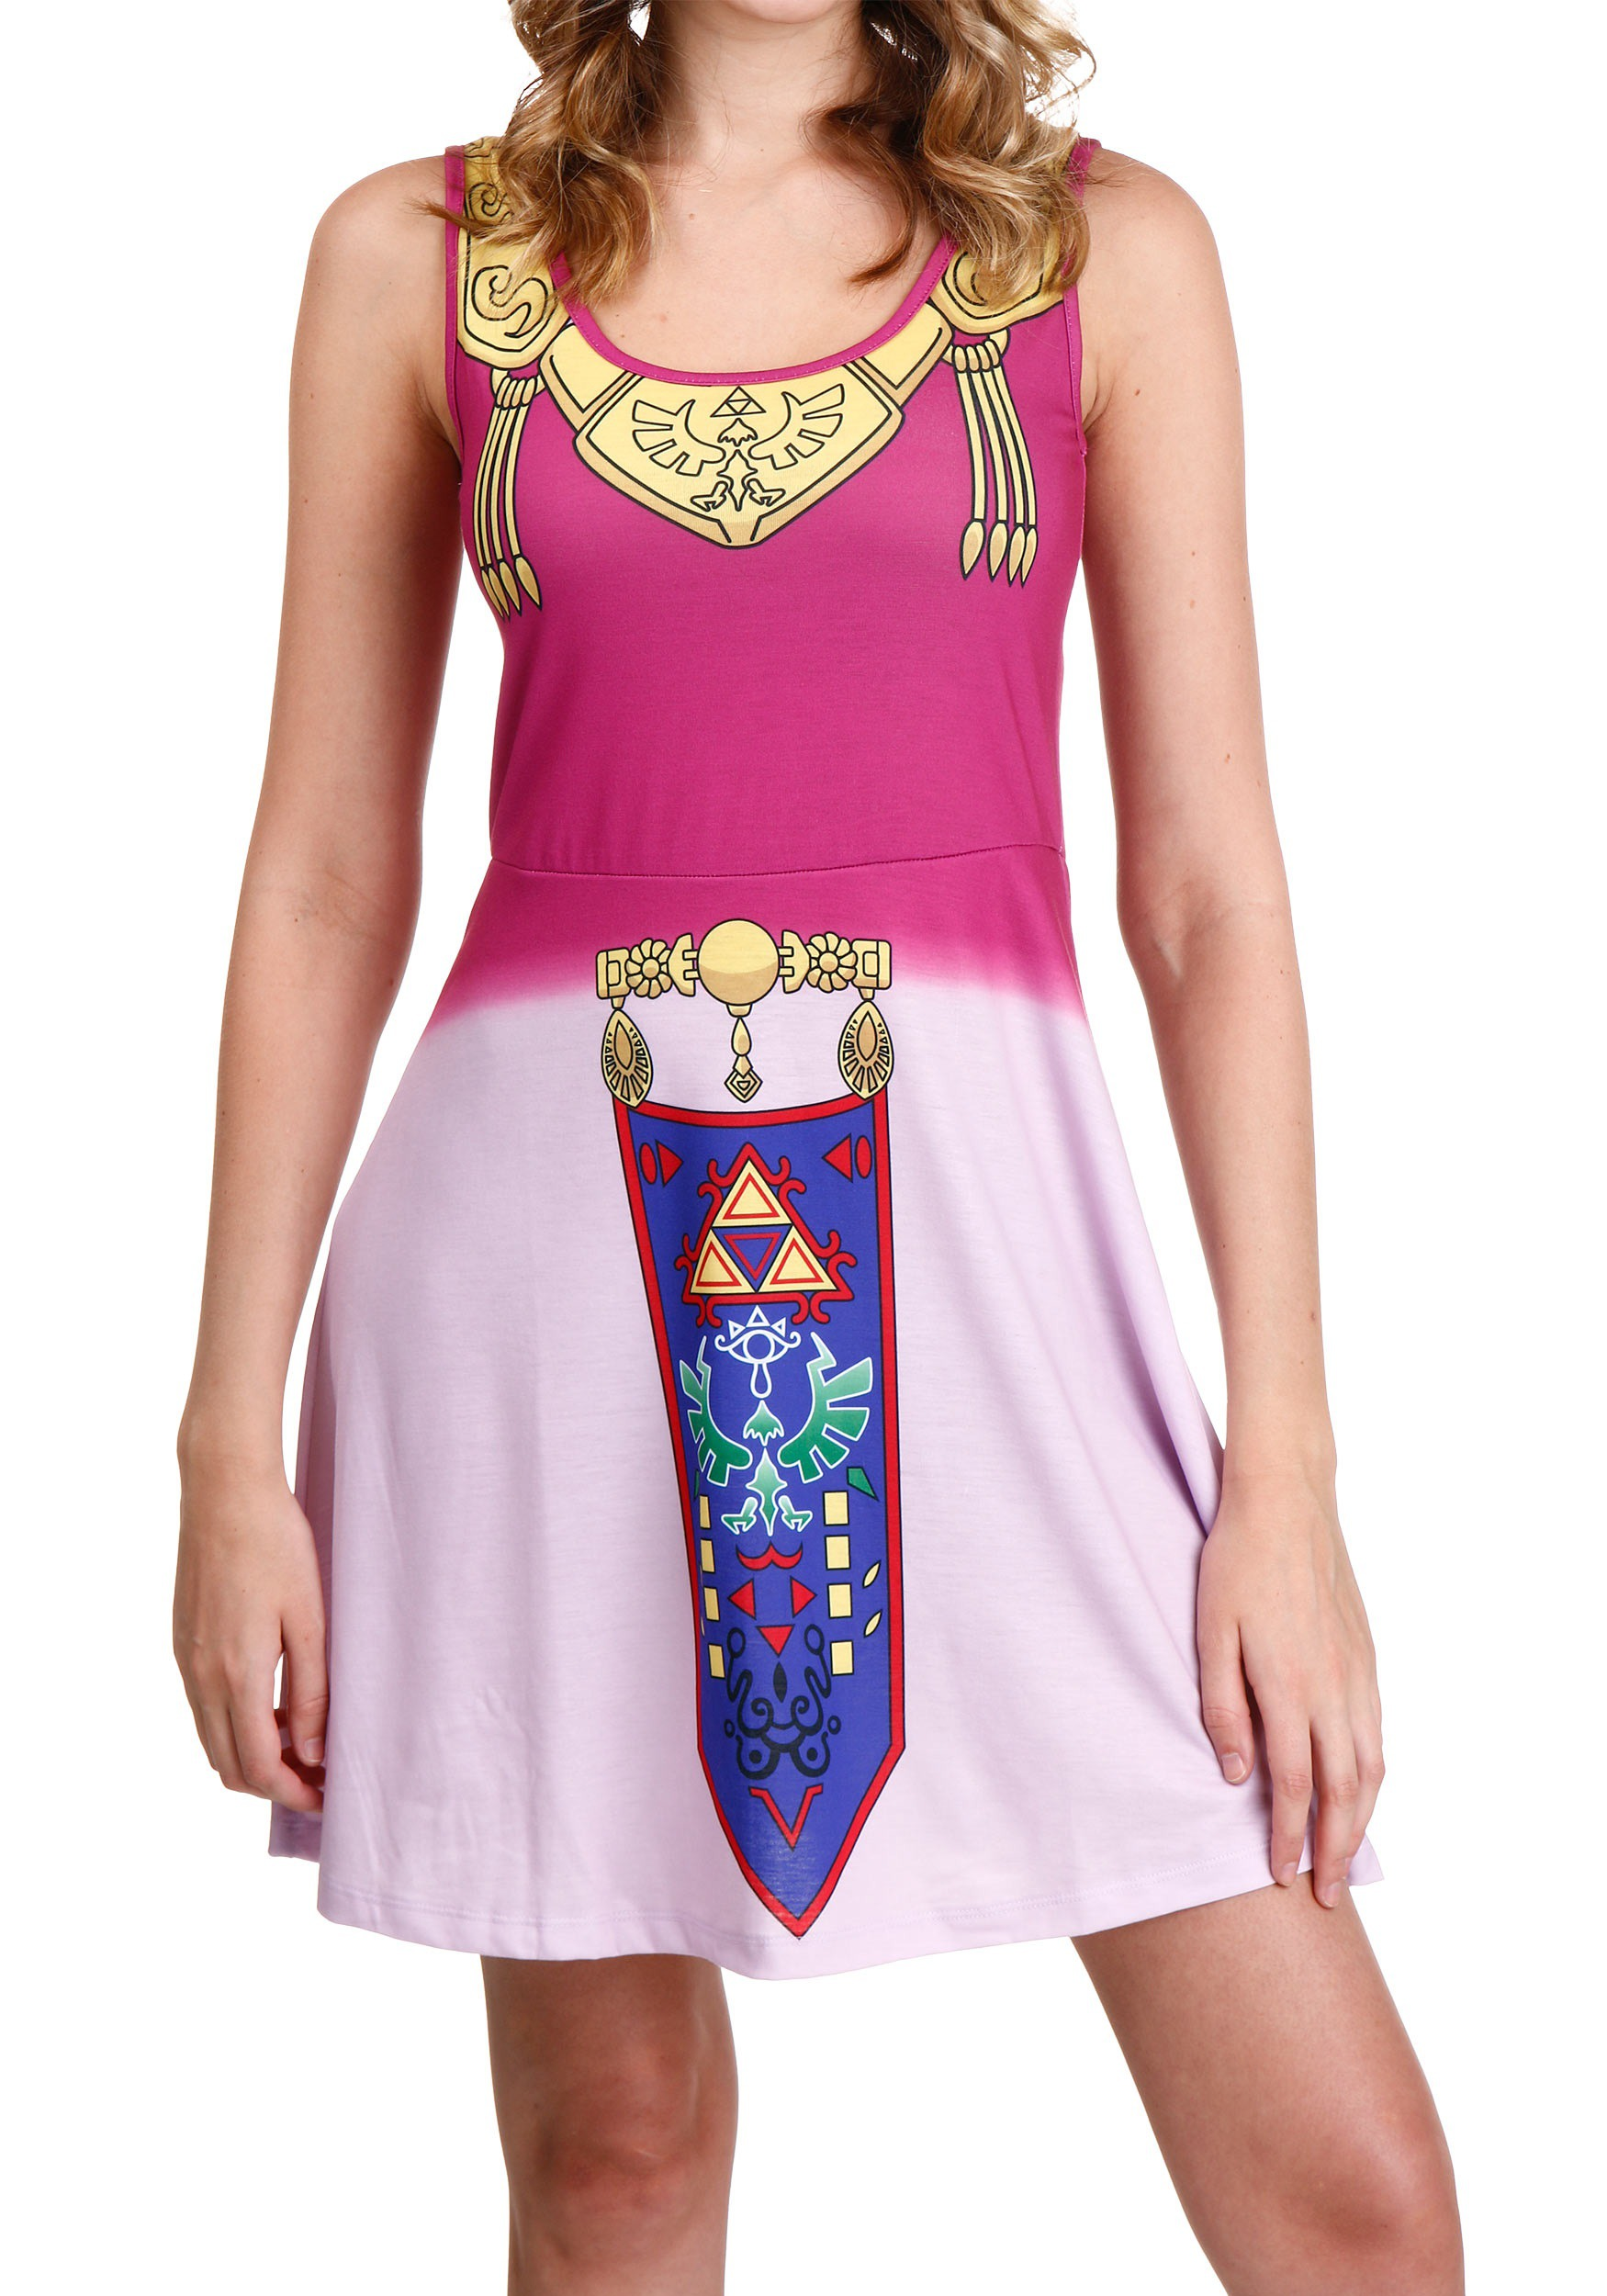 Legend of zelda i am zelda skater dress solutioingenieria Gallery